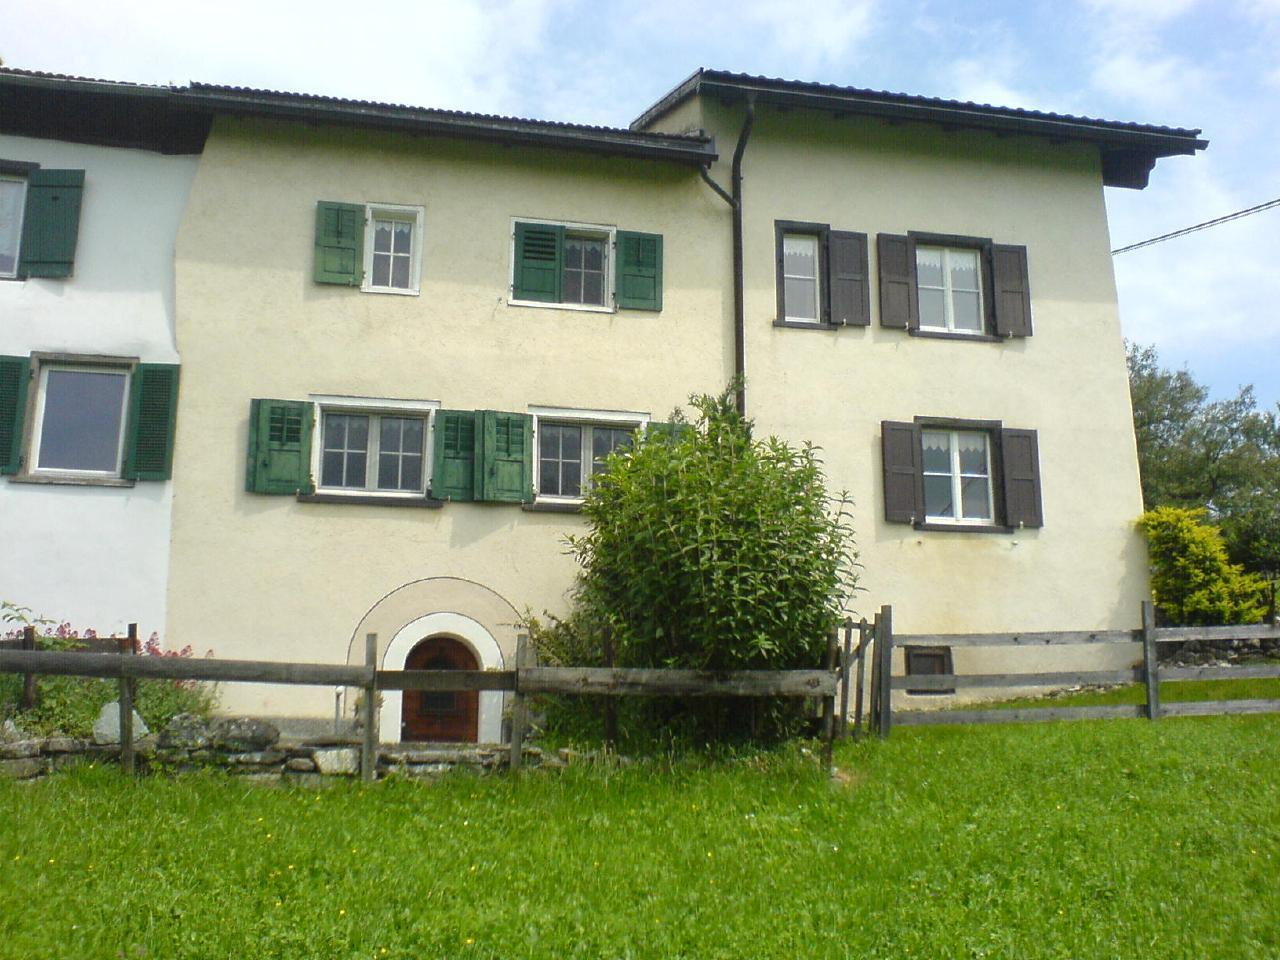 Maison de vacances Elfihuus***Sterne Ferienhaus im Heidiland mit 5 Zimmer (2528615), Maienfeld, Pays d'Heidi, Suisse Orientale, Suisse, image 9